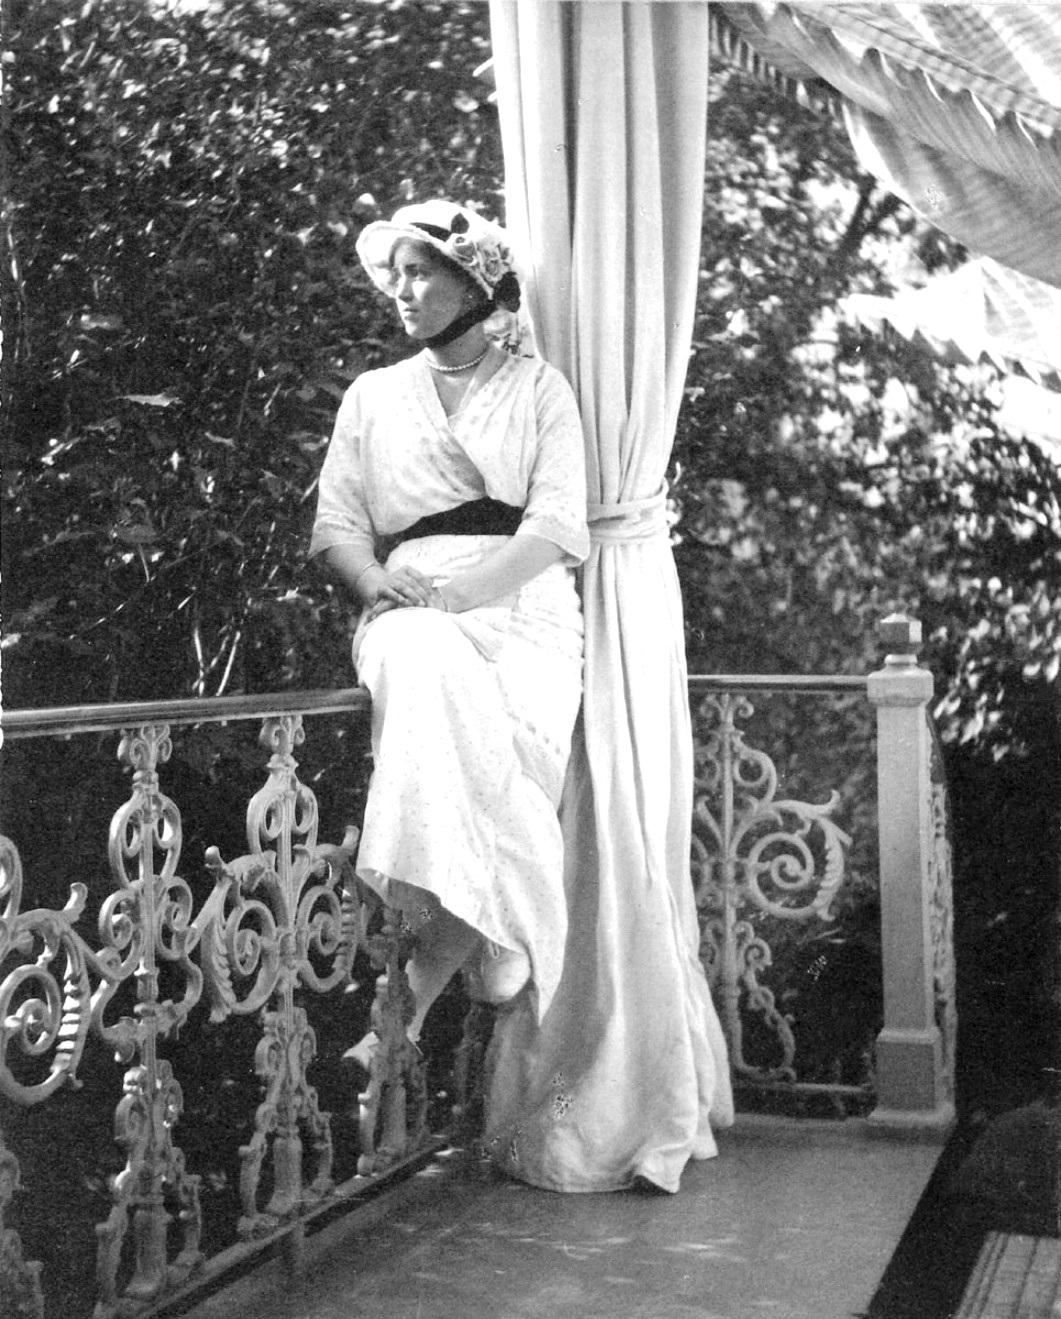 1914. Мария на балконе Александровского дворца. Царское село.